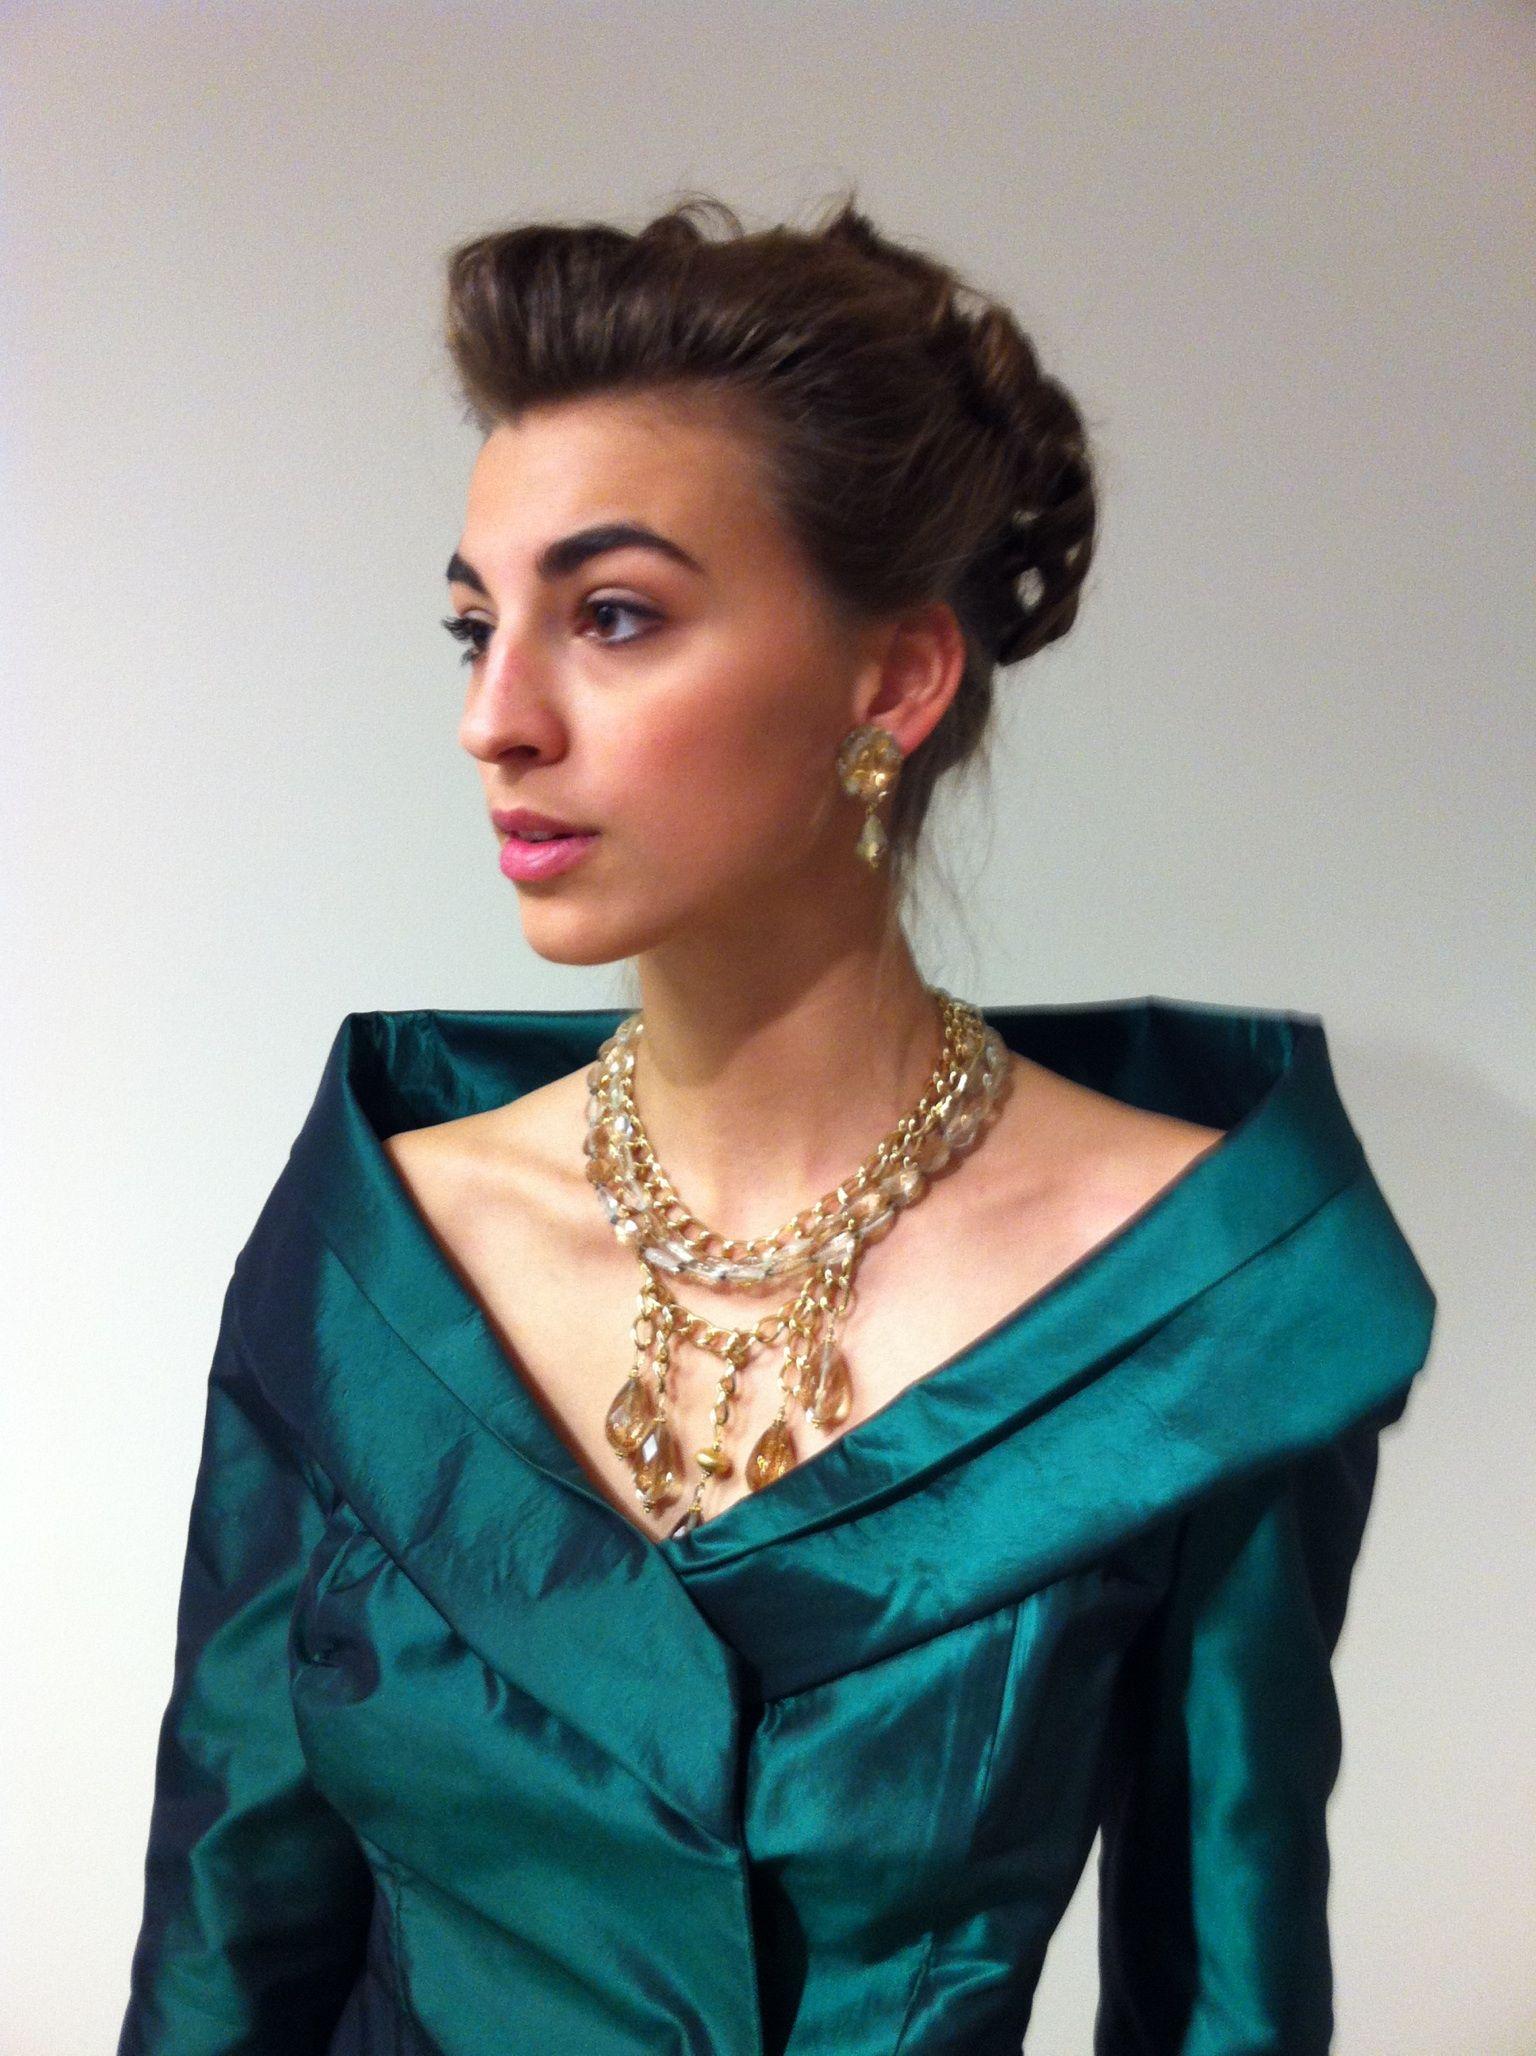 Charlotte Herr Jewelry. Terri-Ives.com